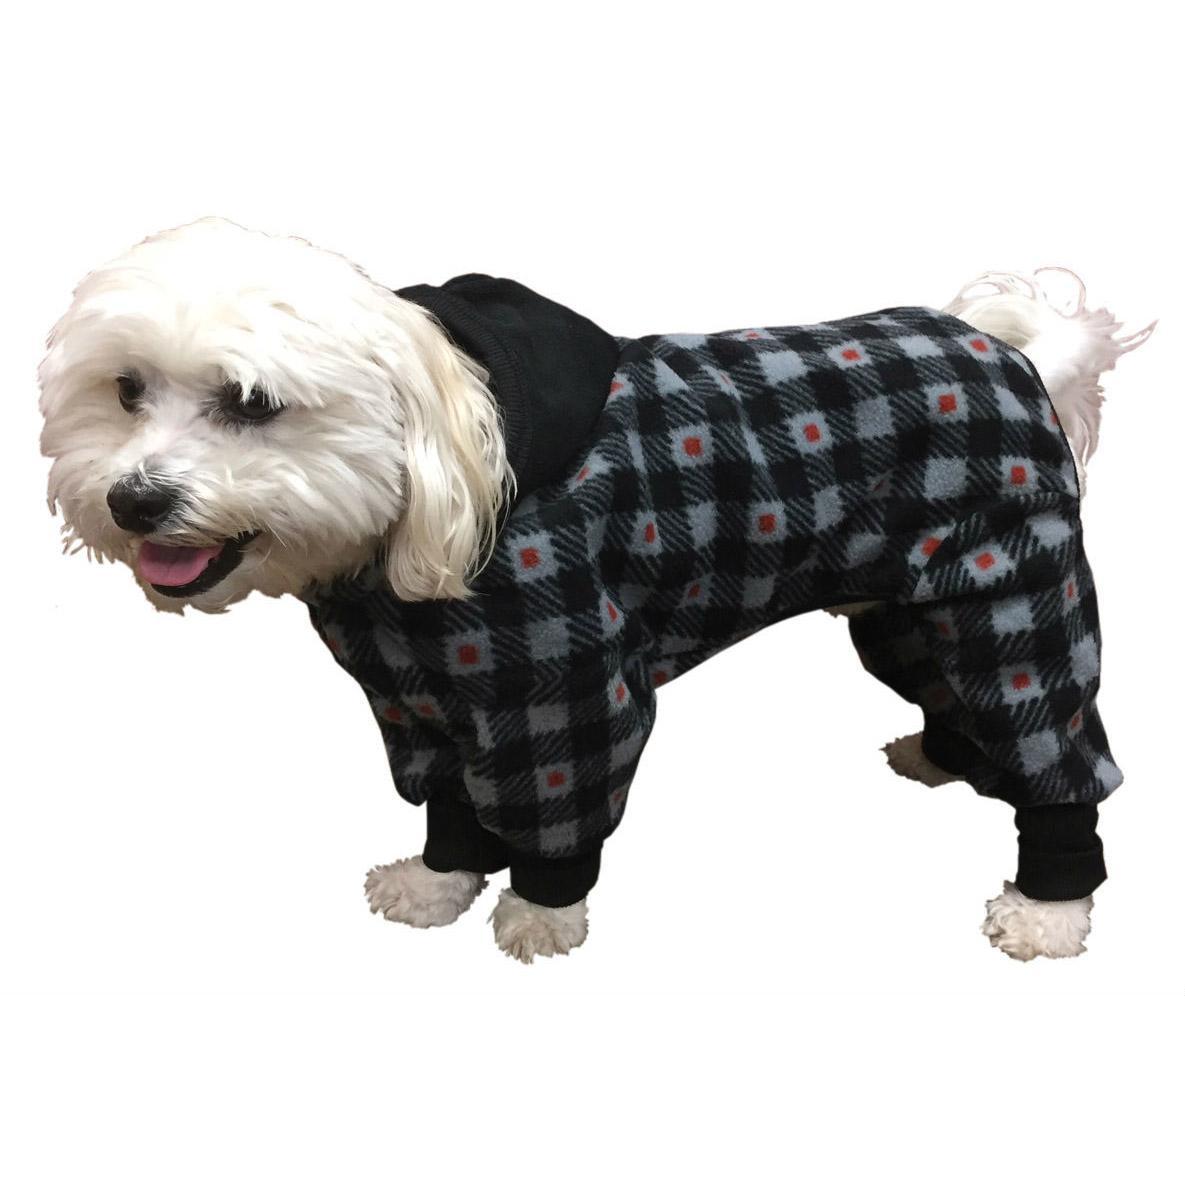 SnoJam Dog Fleece Bodysuit by Ultra Paws - Buffalo Dog, Grey/Red